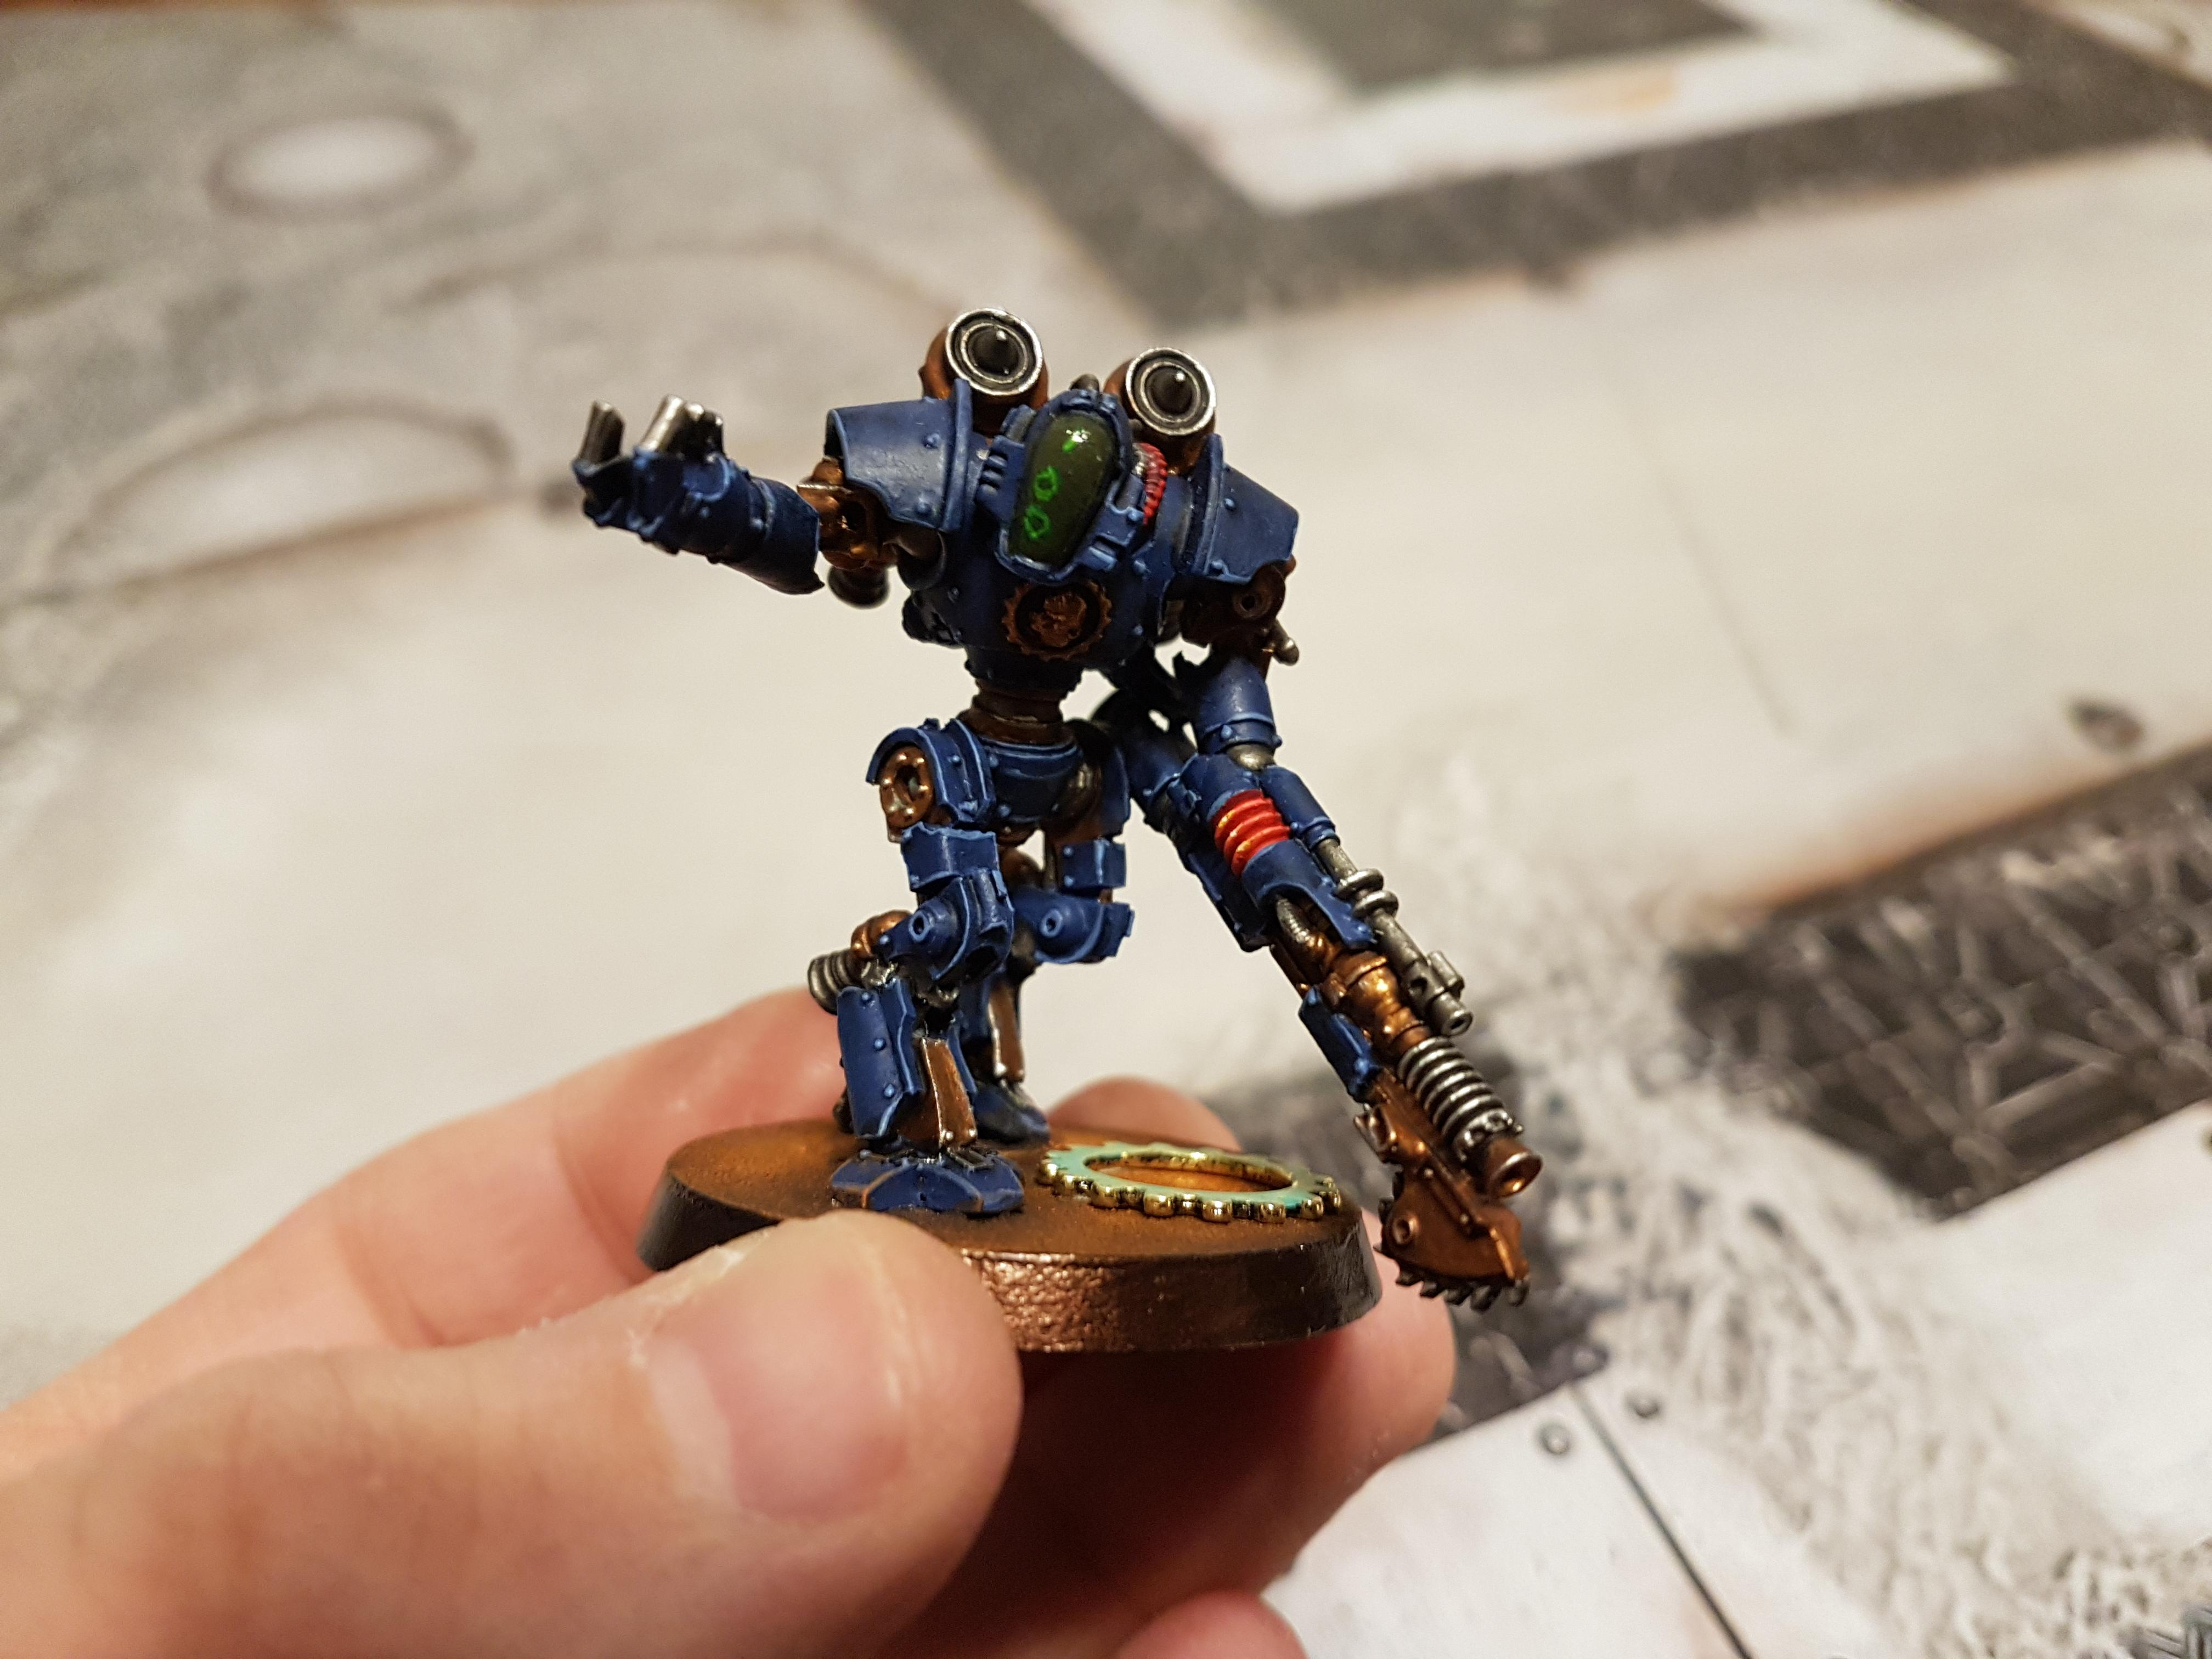 Blue, Chainblade, Konor, Lighting Gun, Mechanicum, Mechanicum Thallax Cohort, Thallax, Thallax Cohort